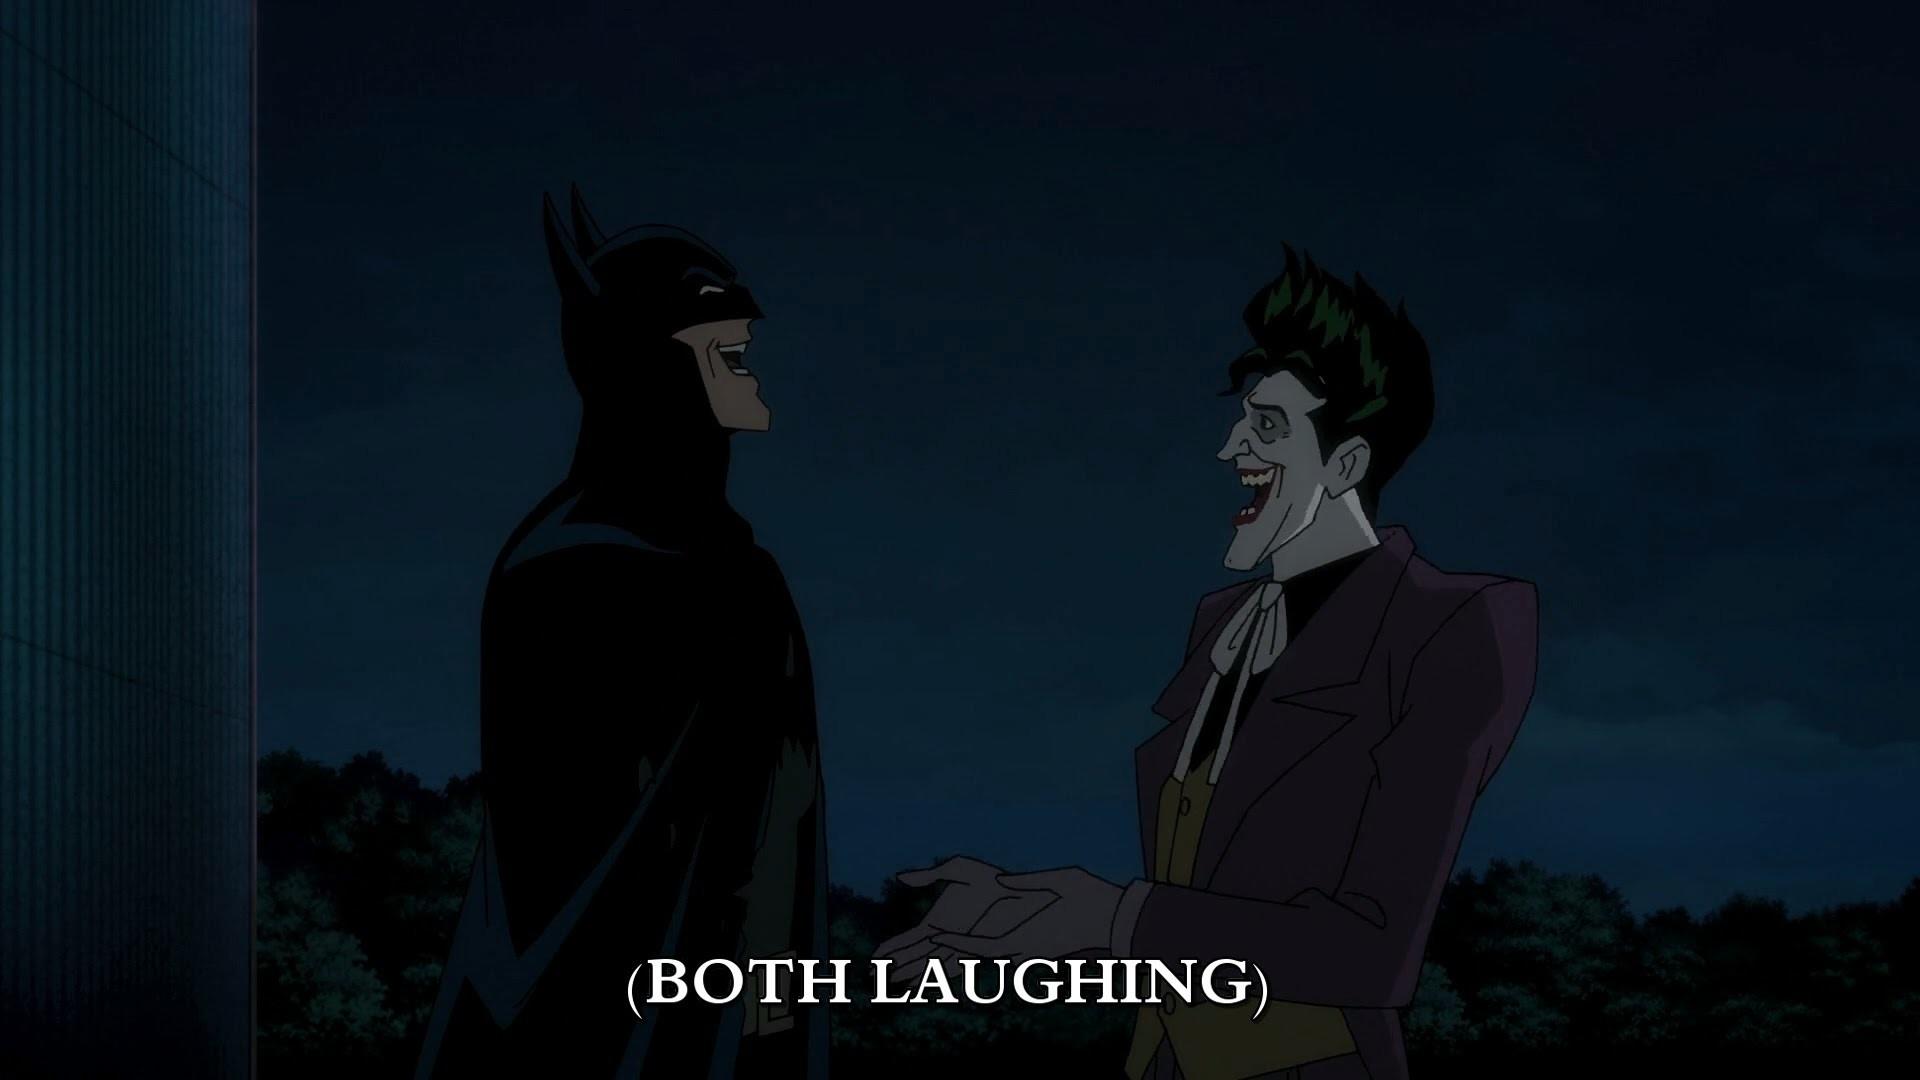 batman laughs with the joker – batman : the killing joke